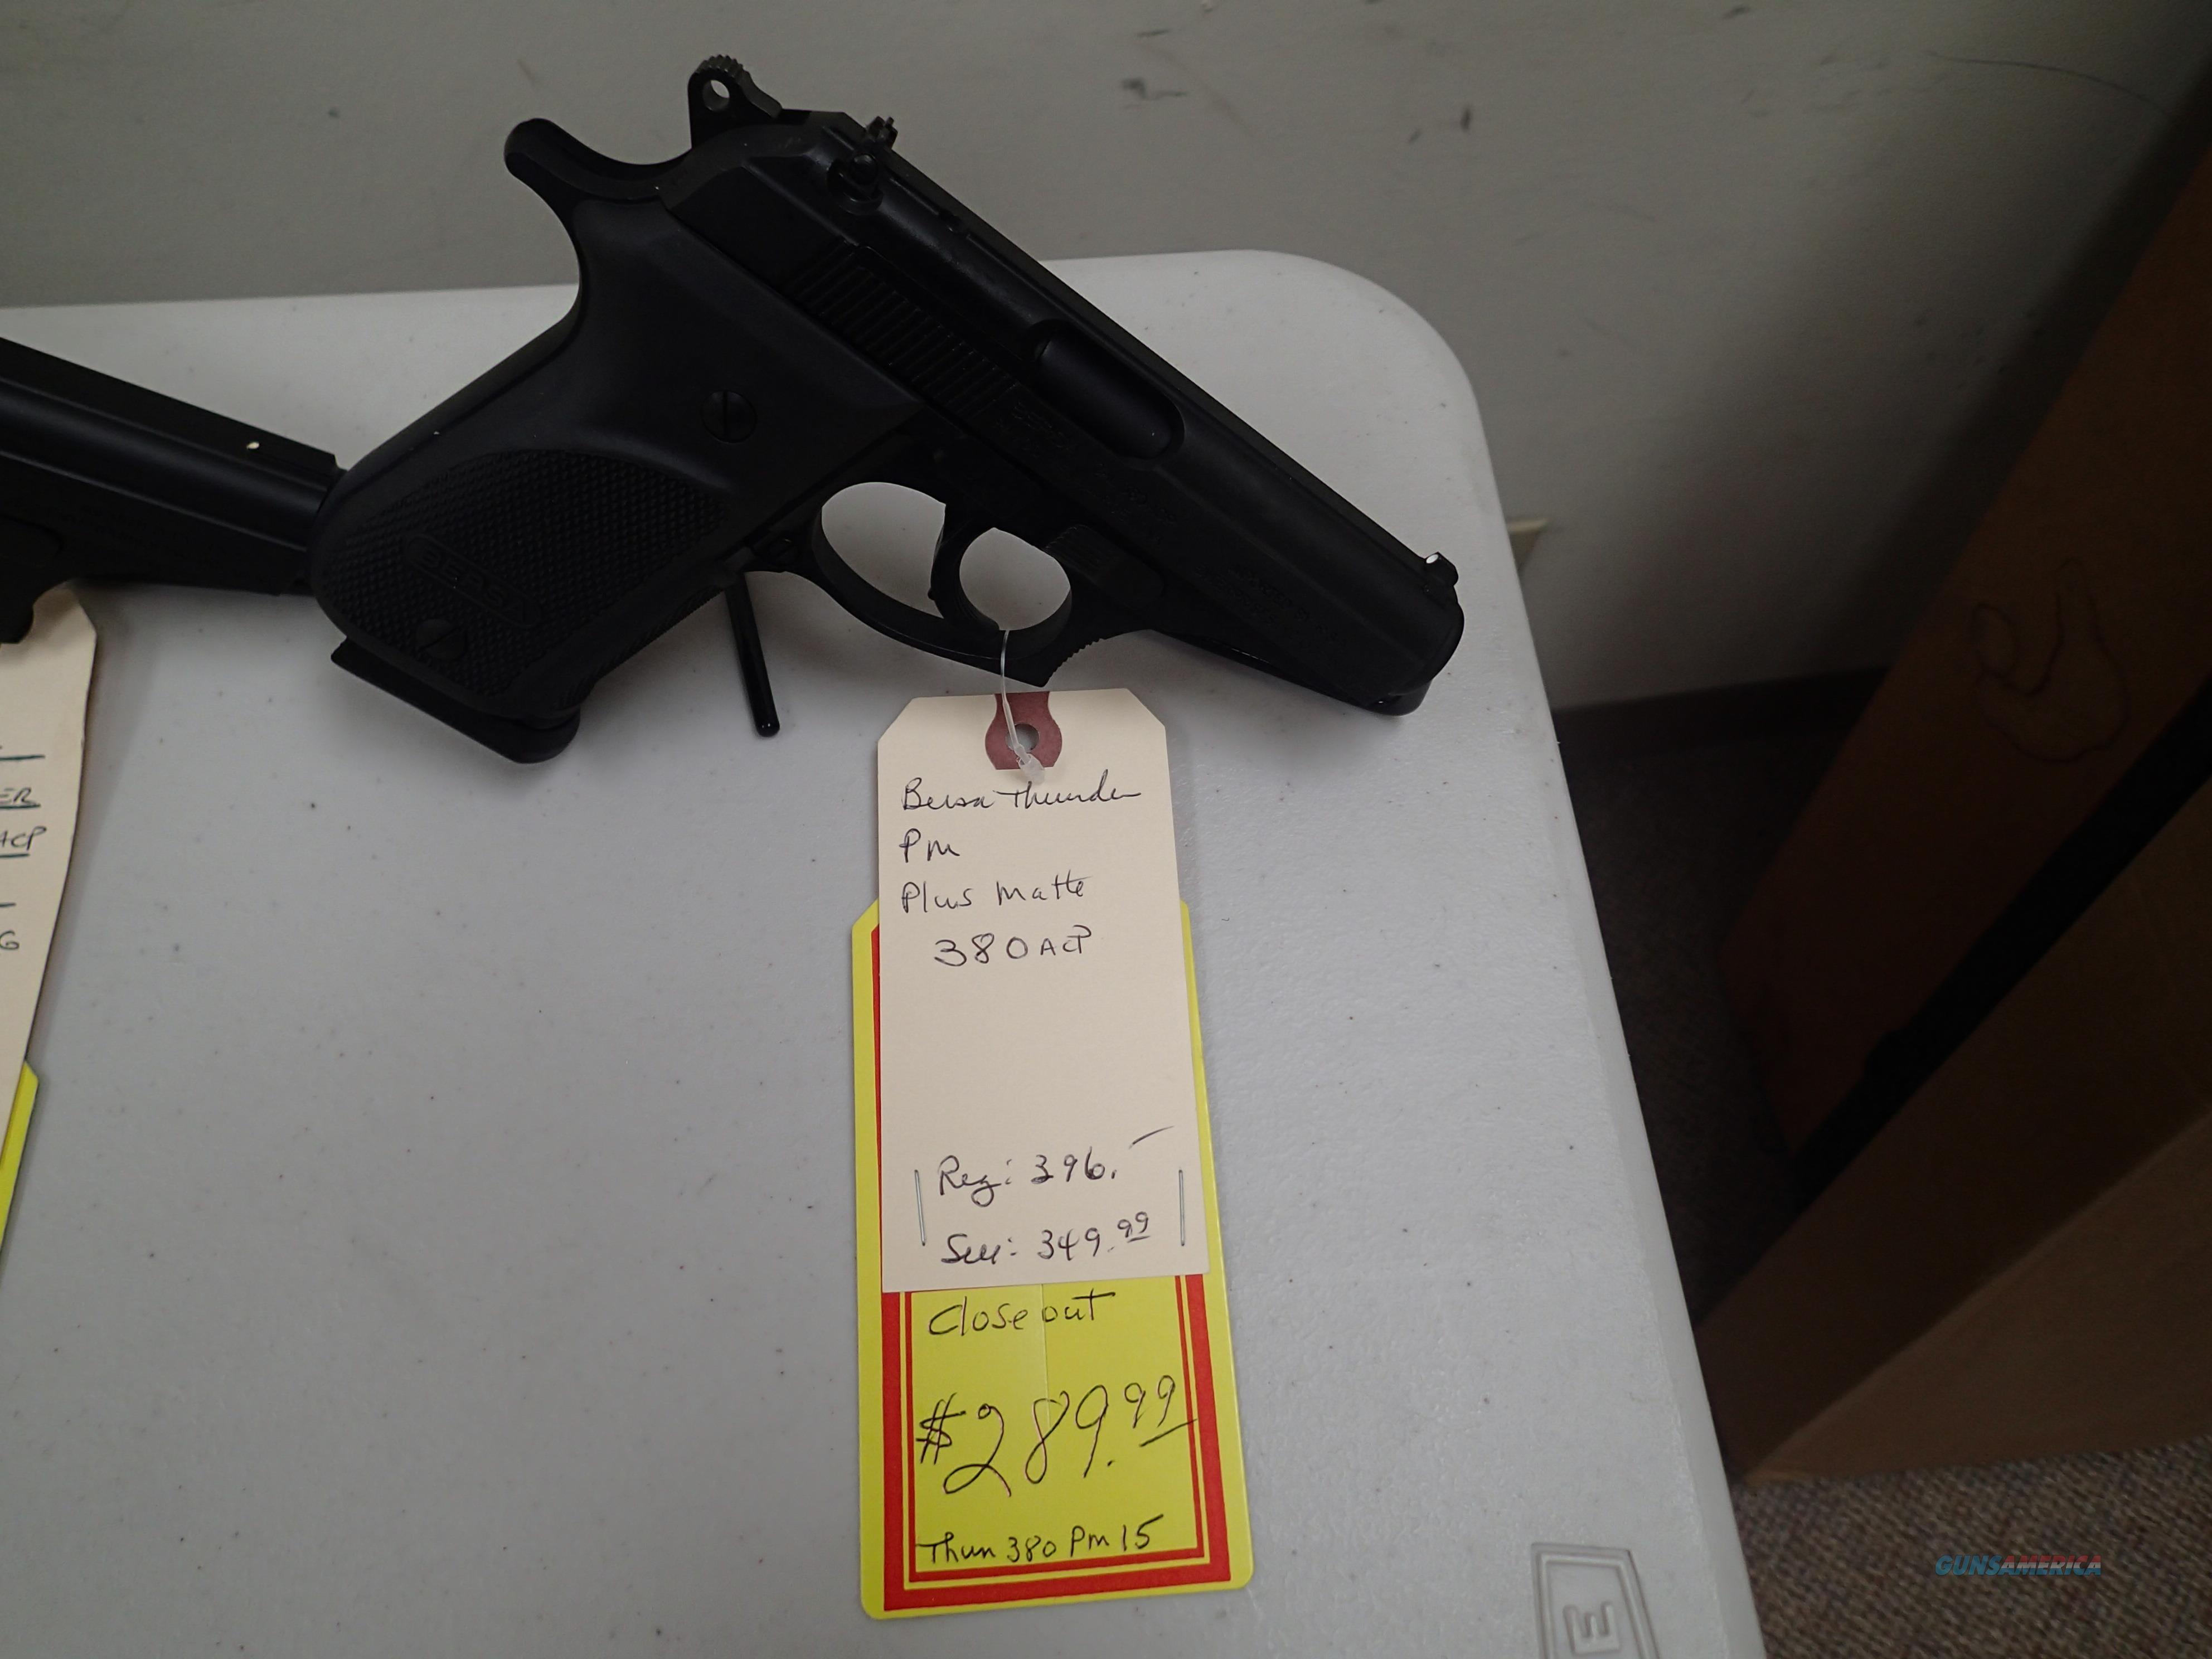 Bersa PM Plus Matte 380acp 1-15rd magazine NIB closeout prices (90385)  Guns > Pistols > Bersa Pistols